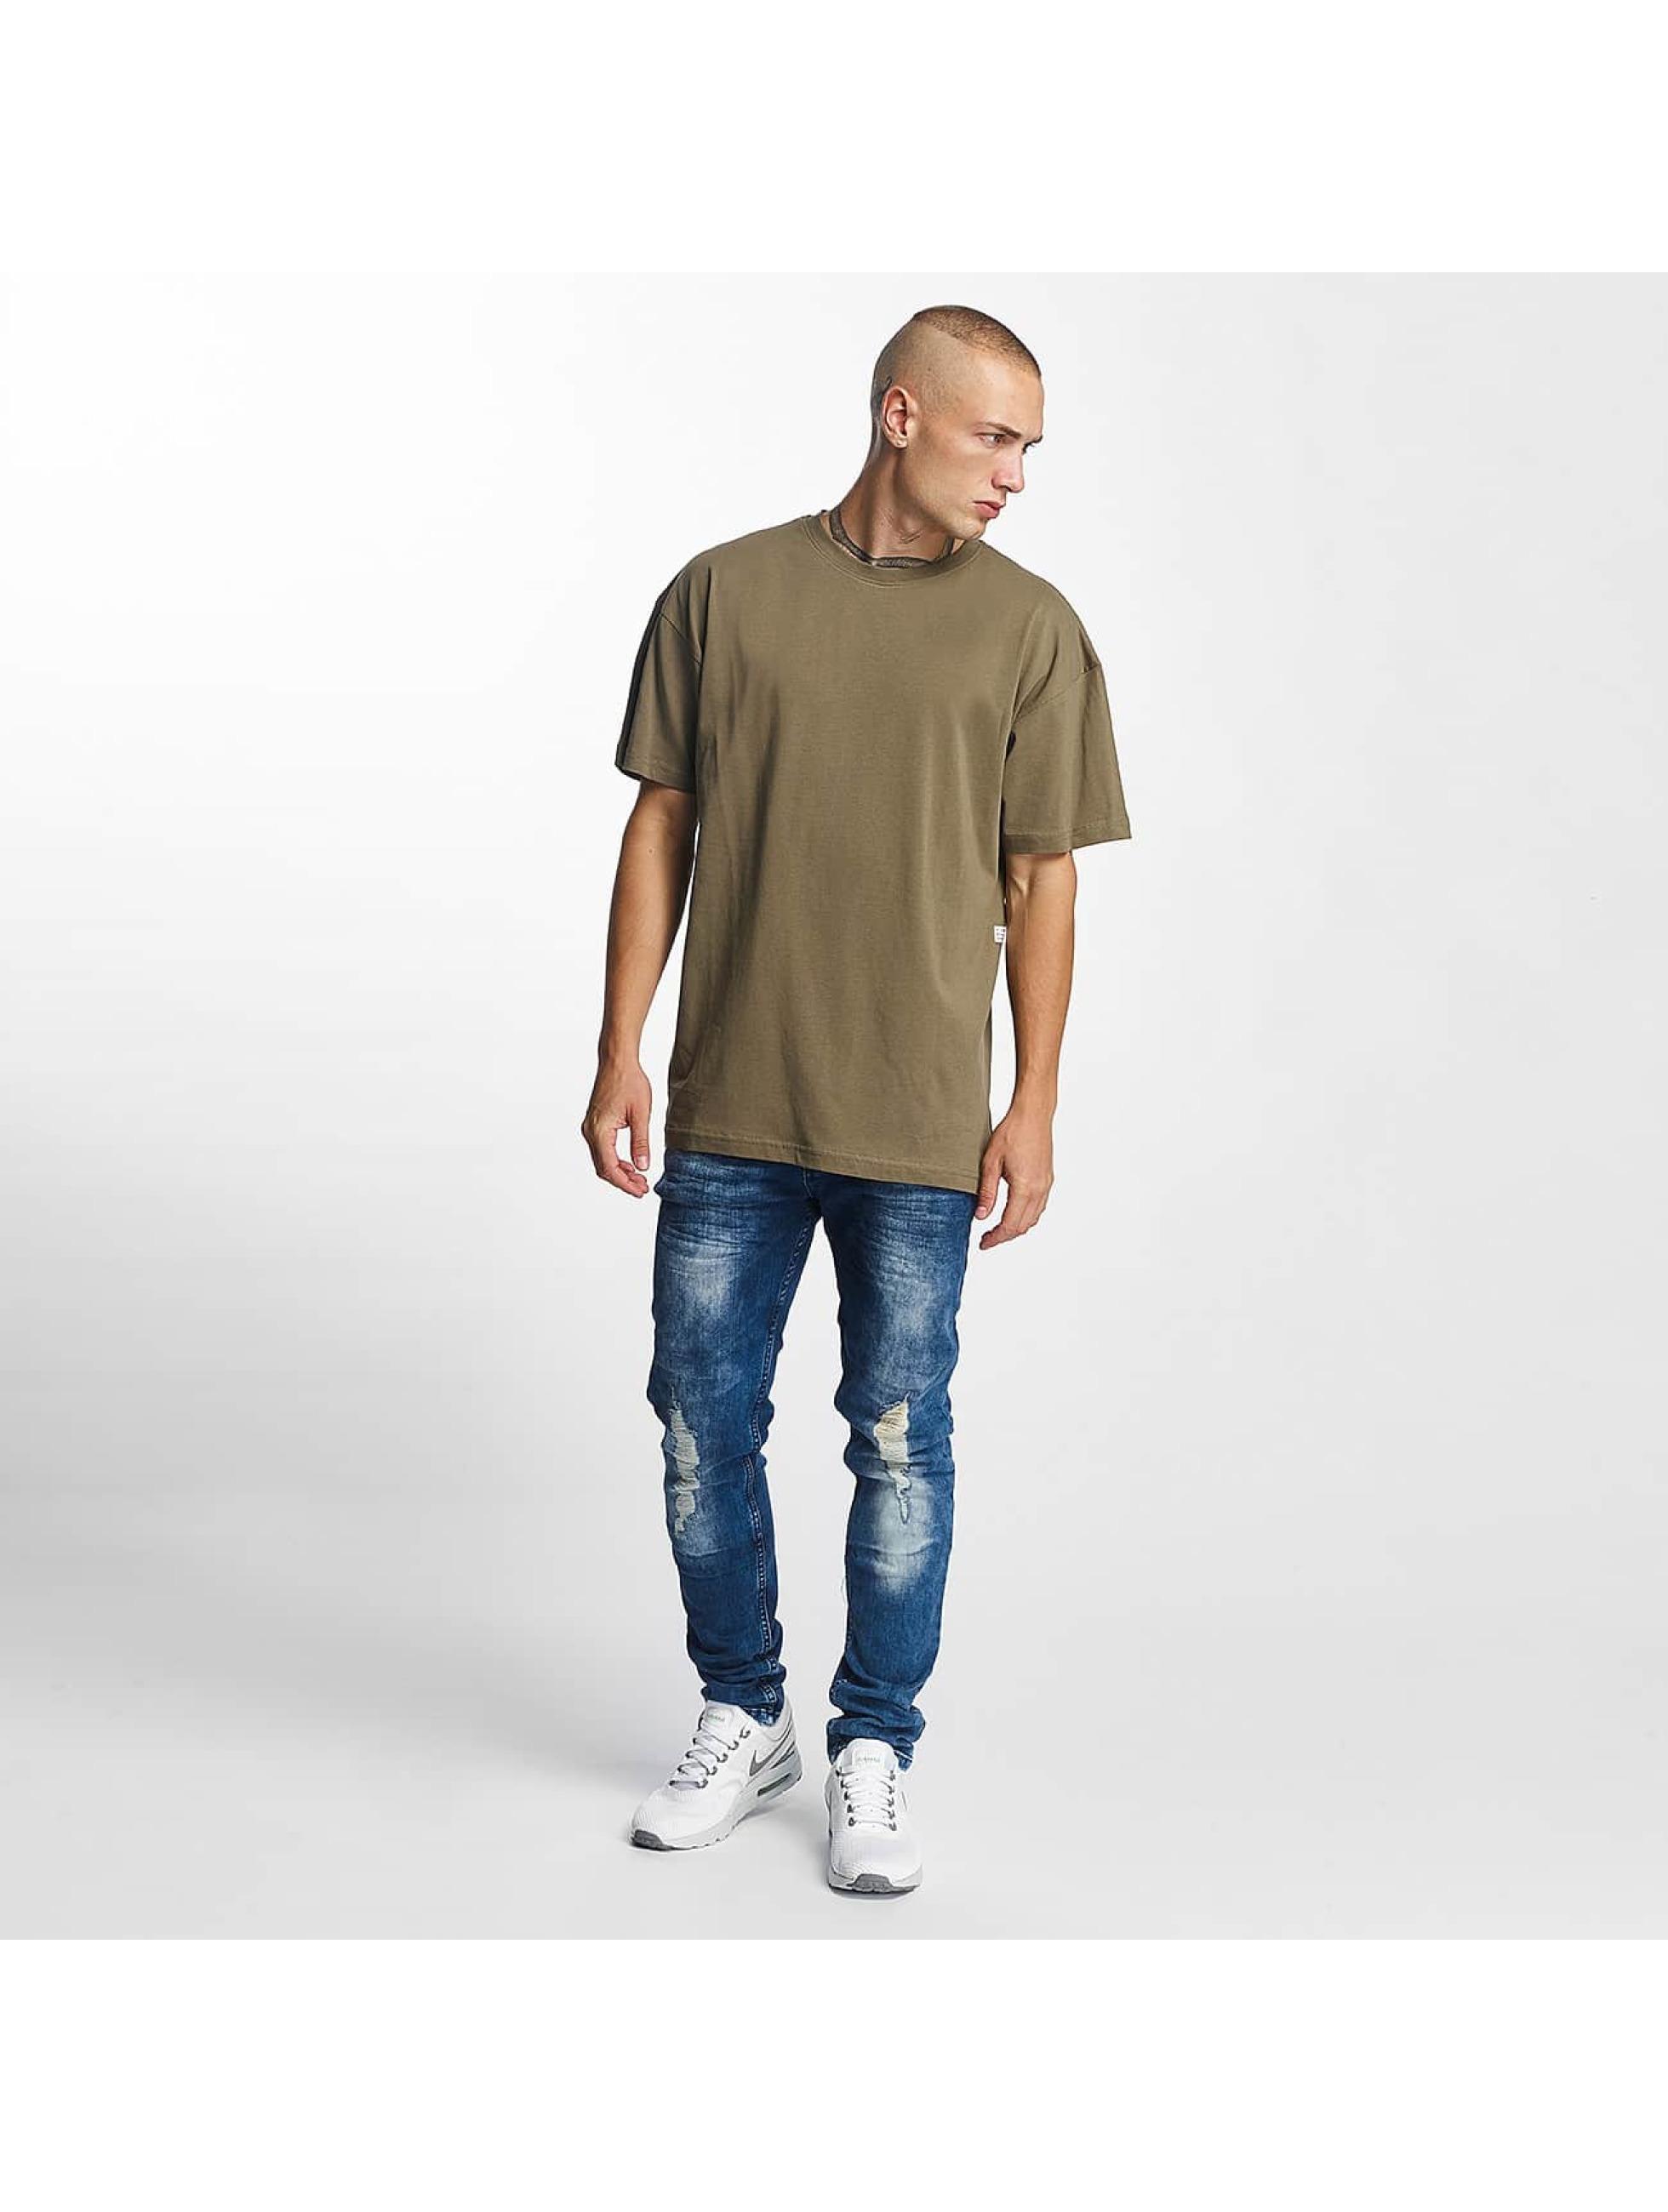 K1X Camiseta Crest oliva